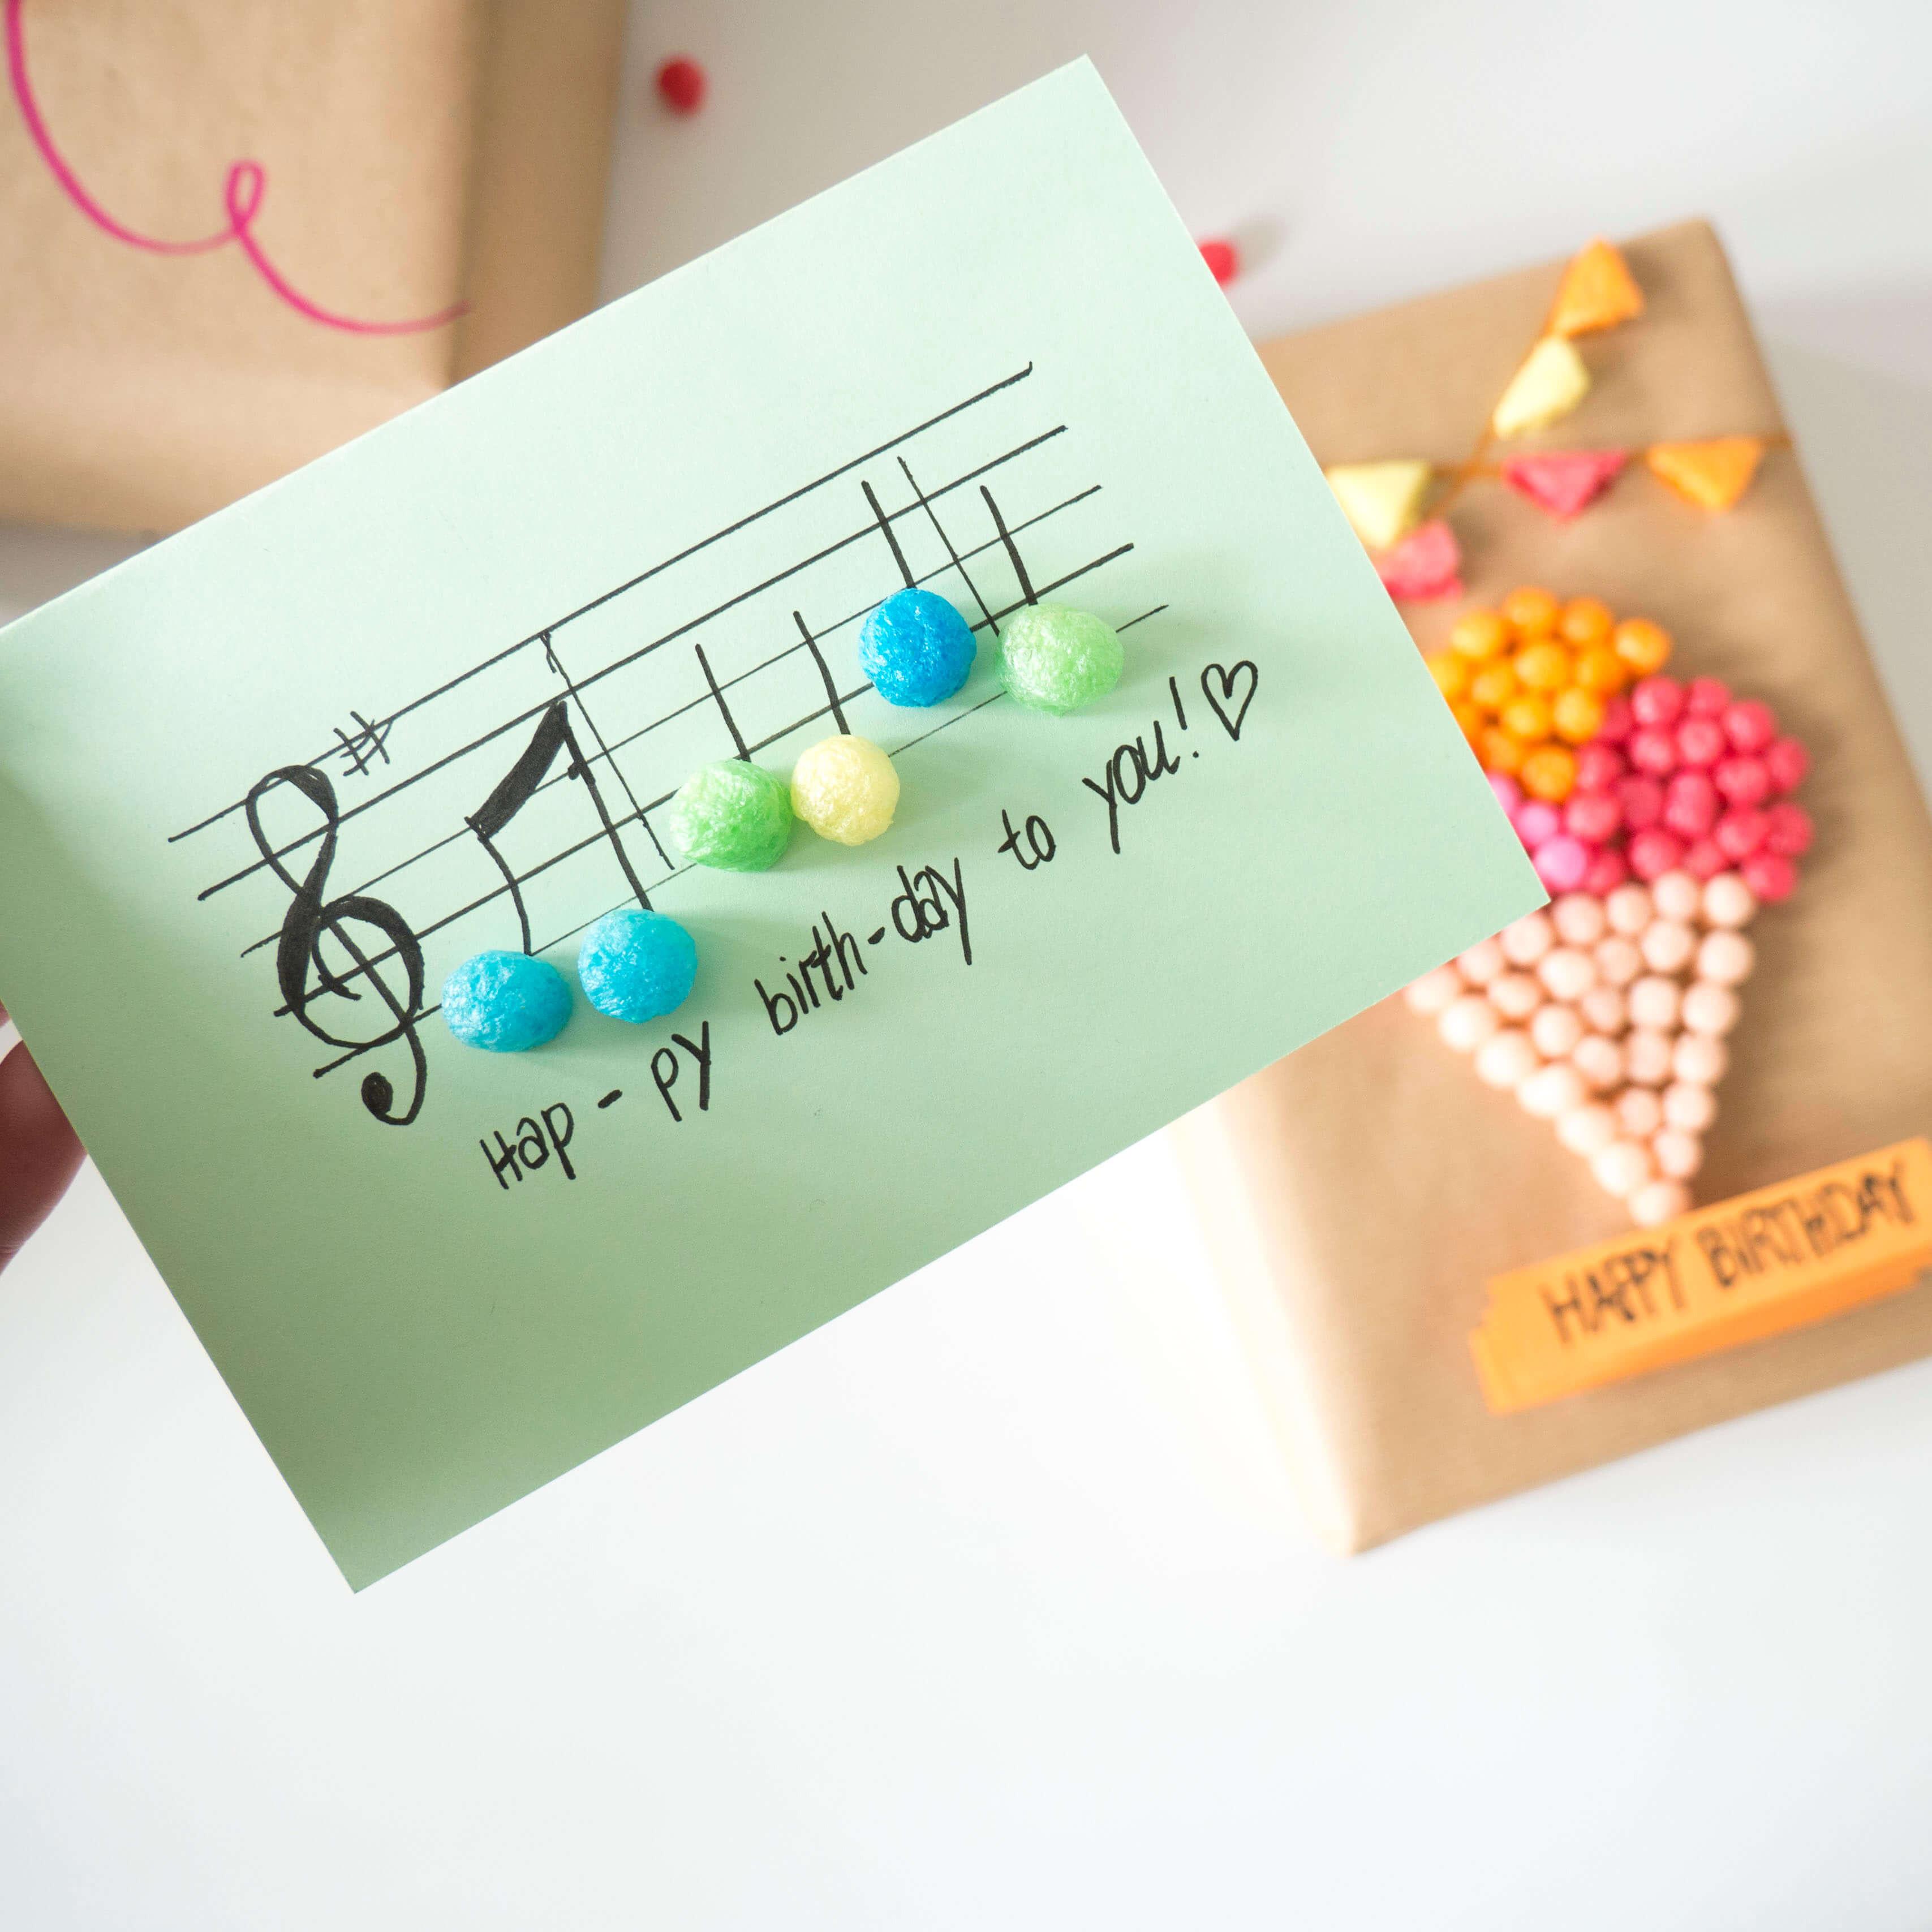 Diy Geburtstagskarten  DIY Kreative Geburtstagskarten und Geschenkverpackungen